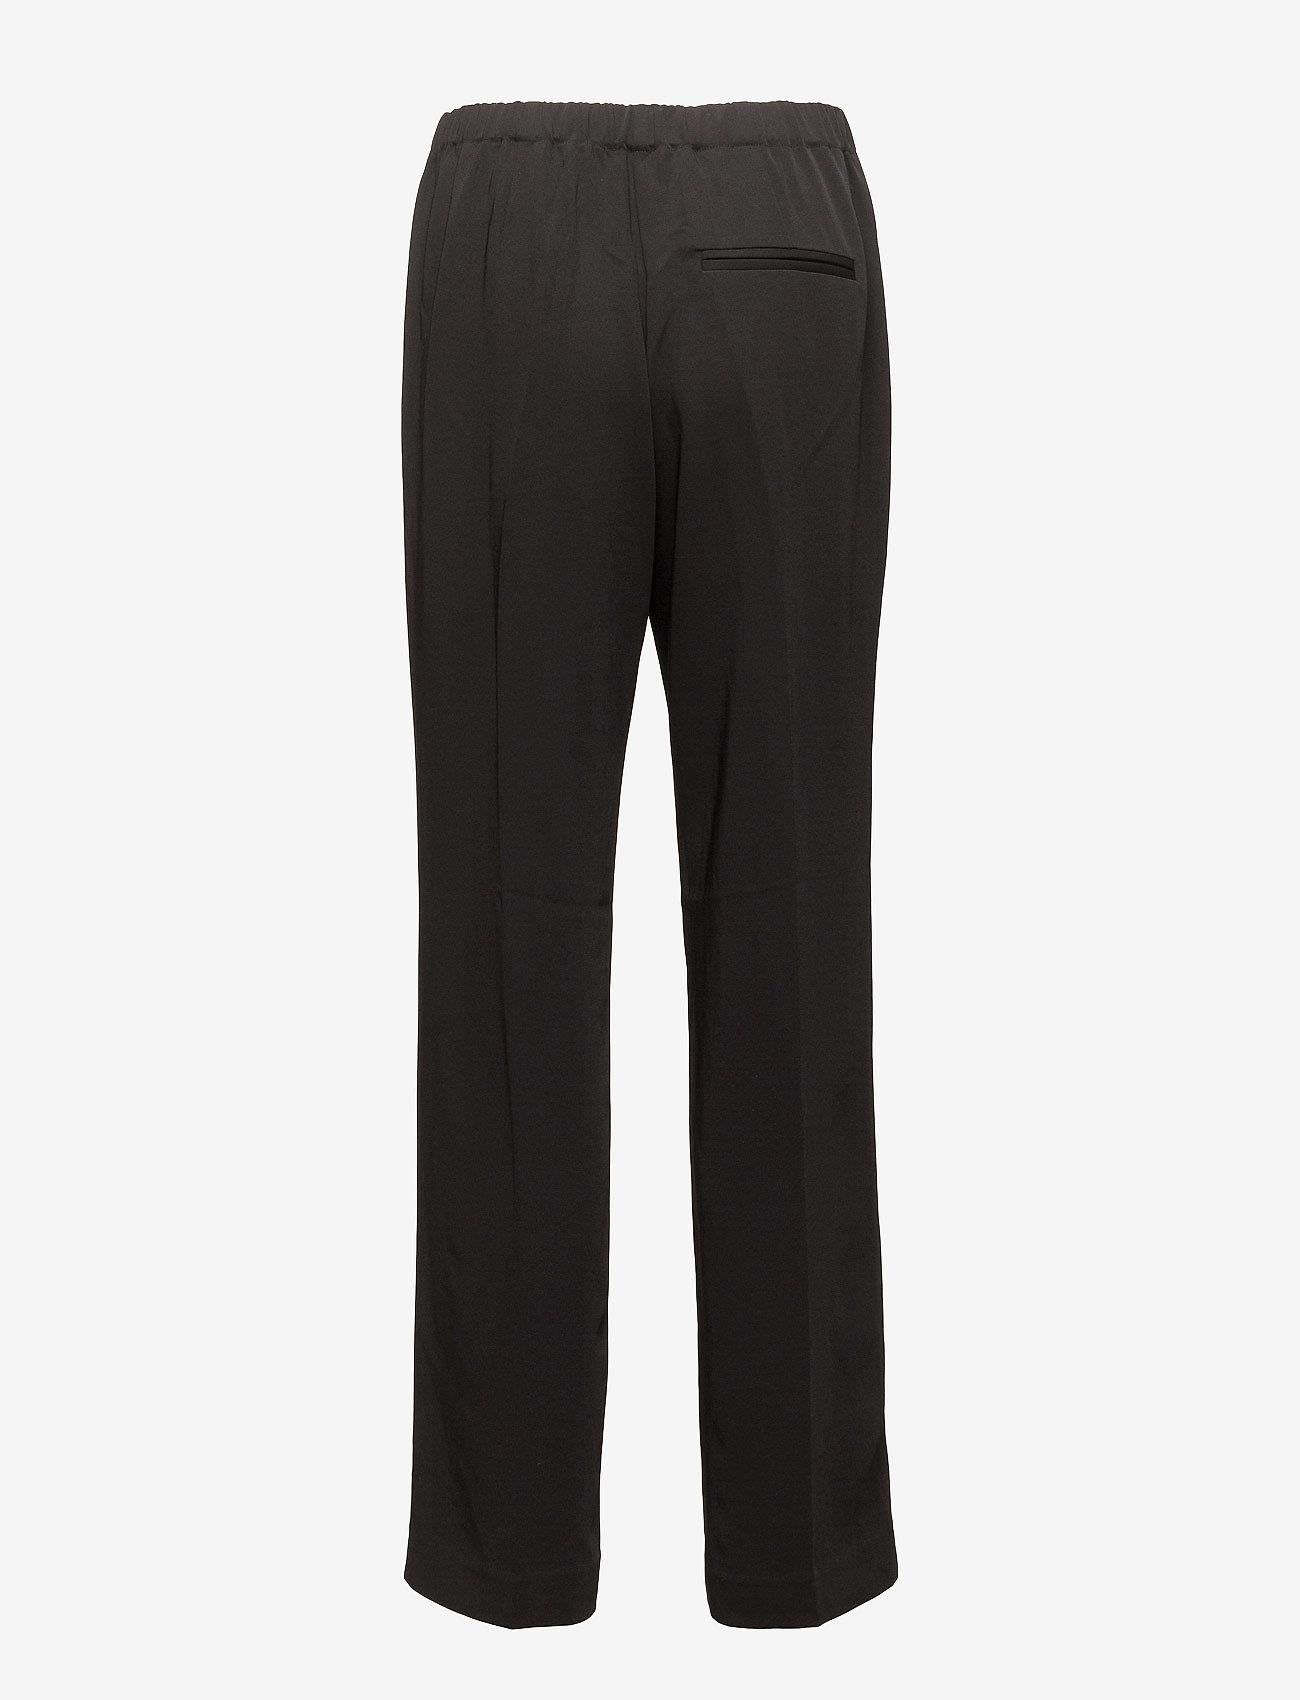 Samsøe Samsøe - Hoys straight pants 7331 - bukser med lige ben - black - 1